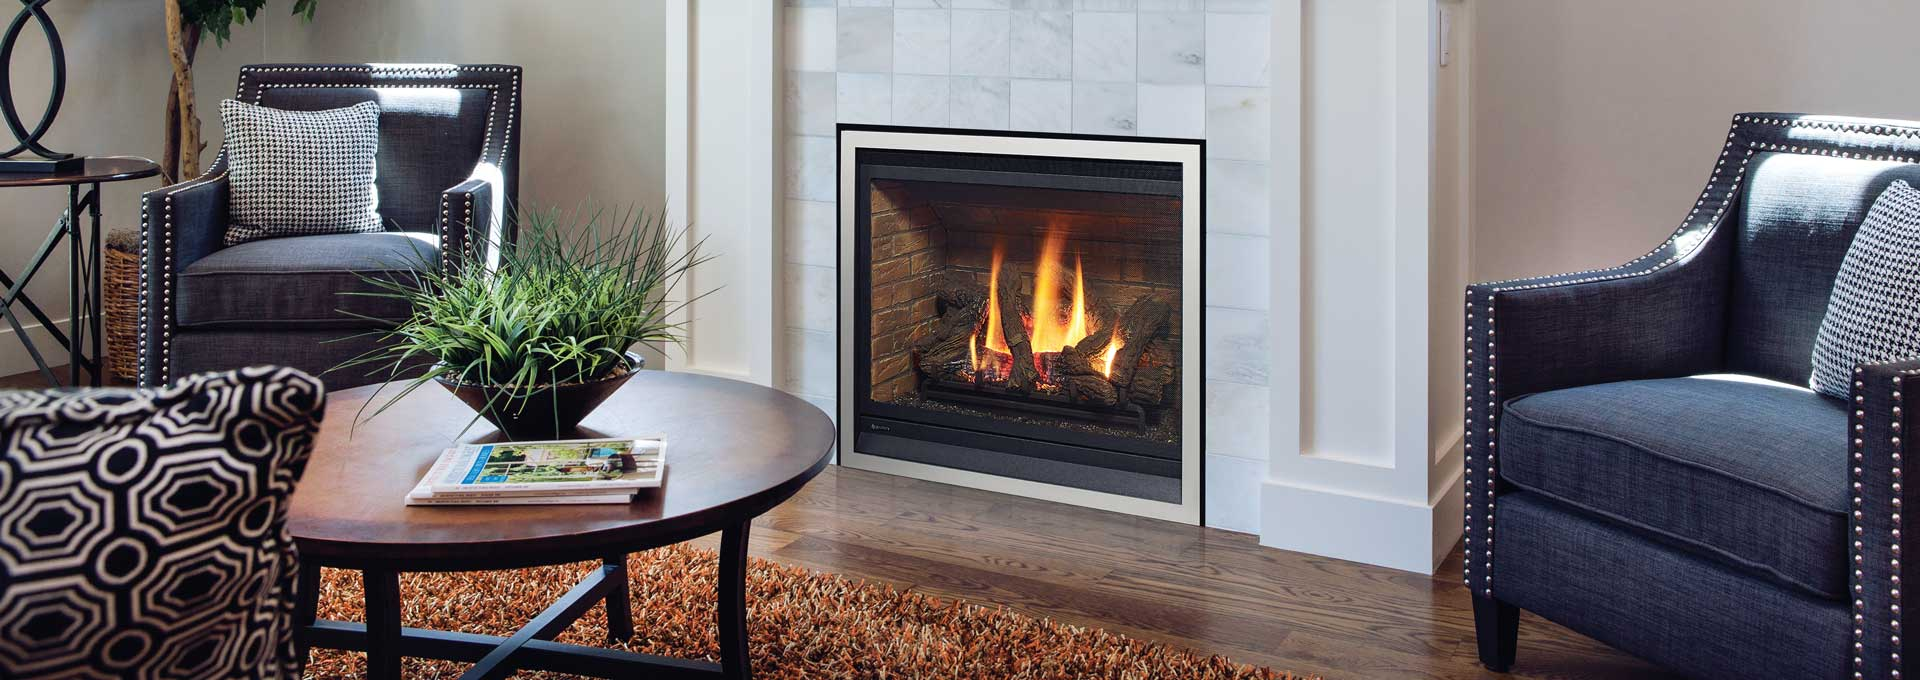 Fireplace Tips San Diego Pro Handyman